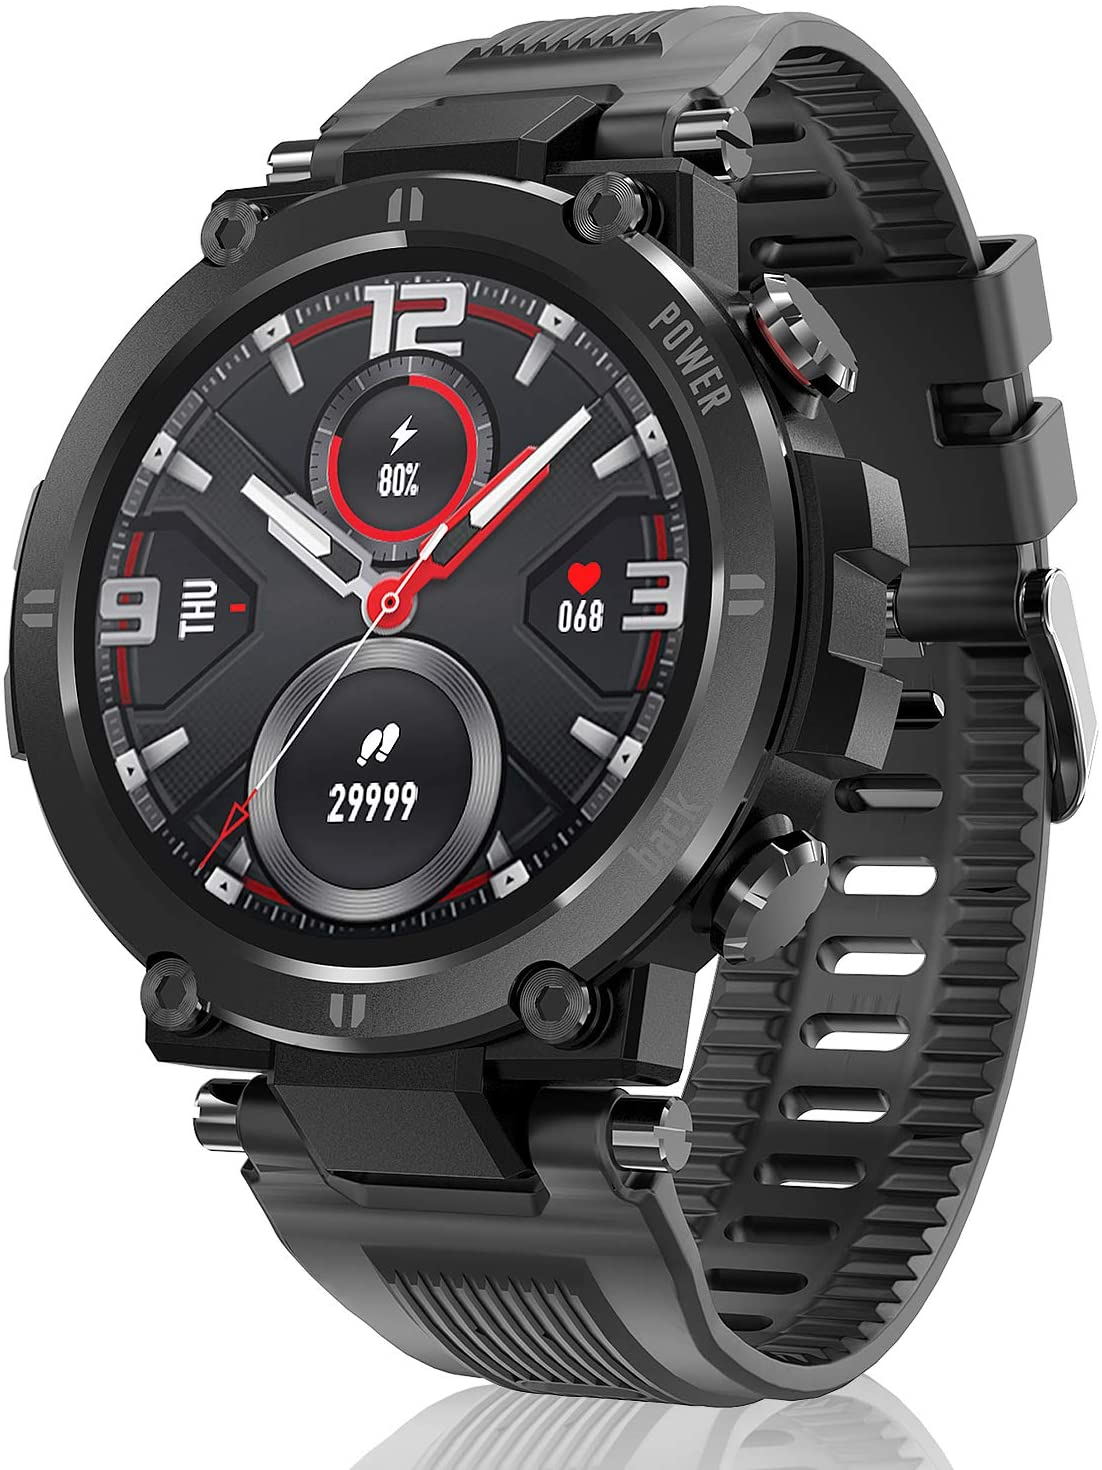 HopoFit Smart Watch